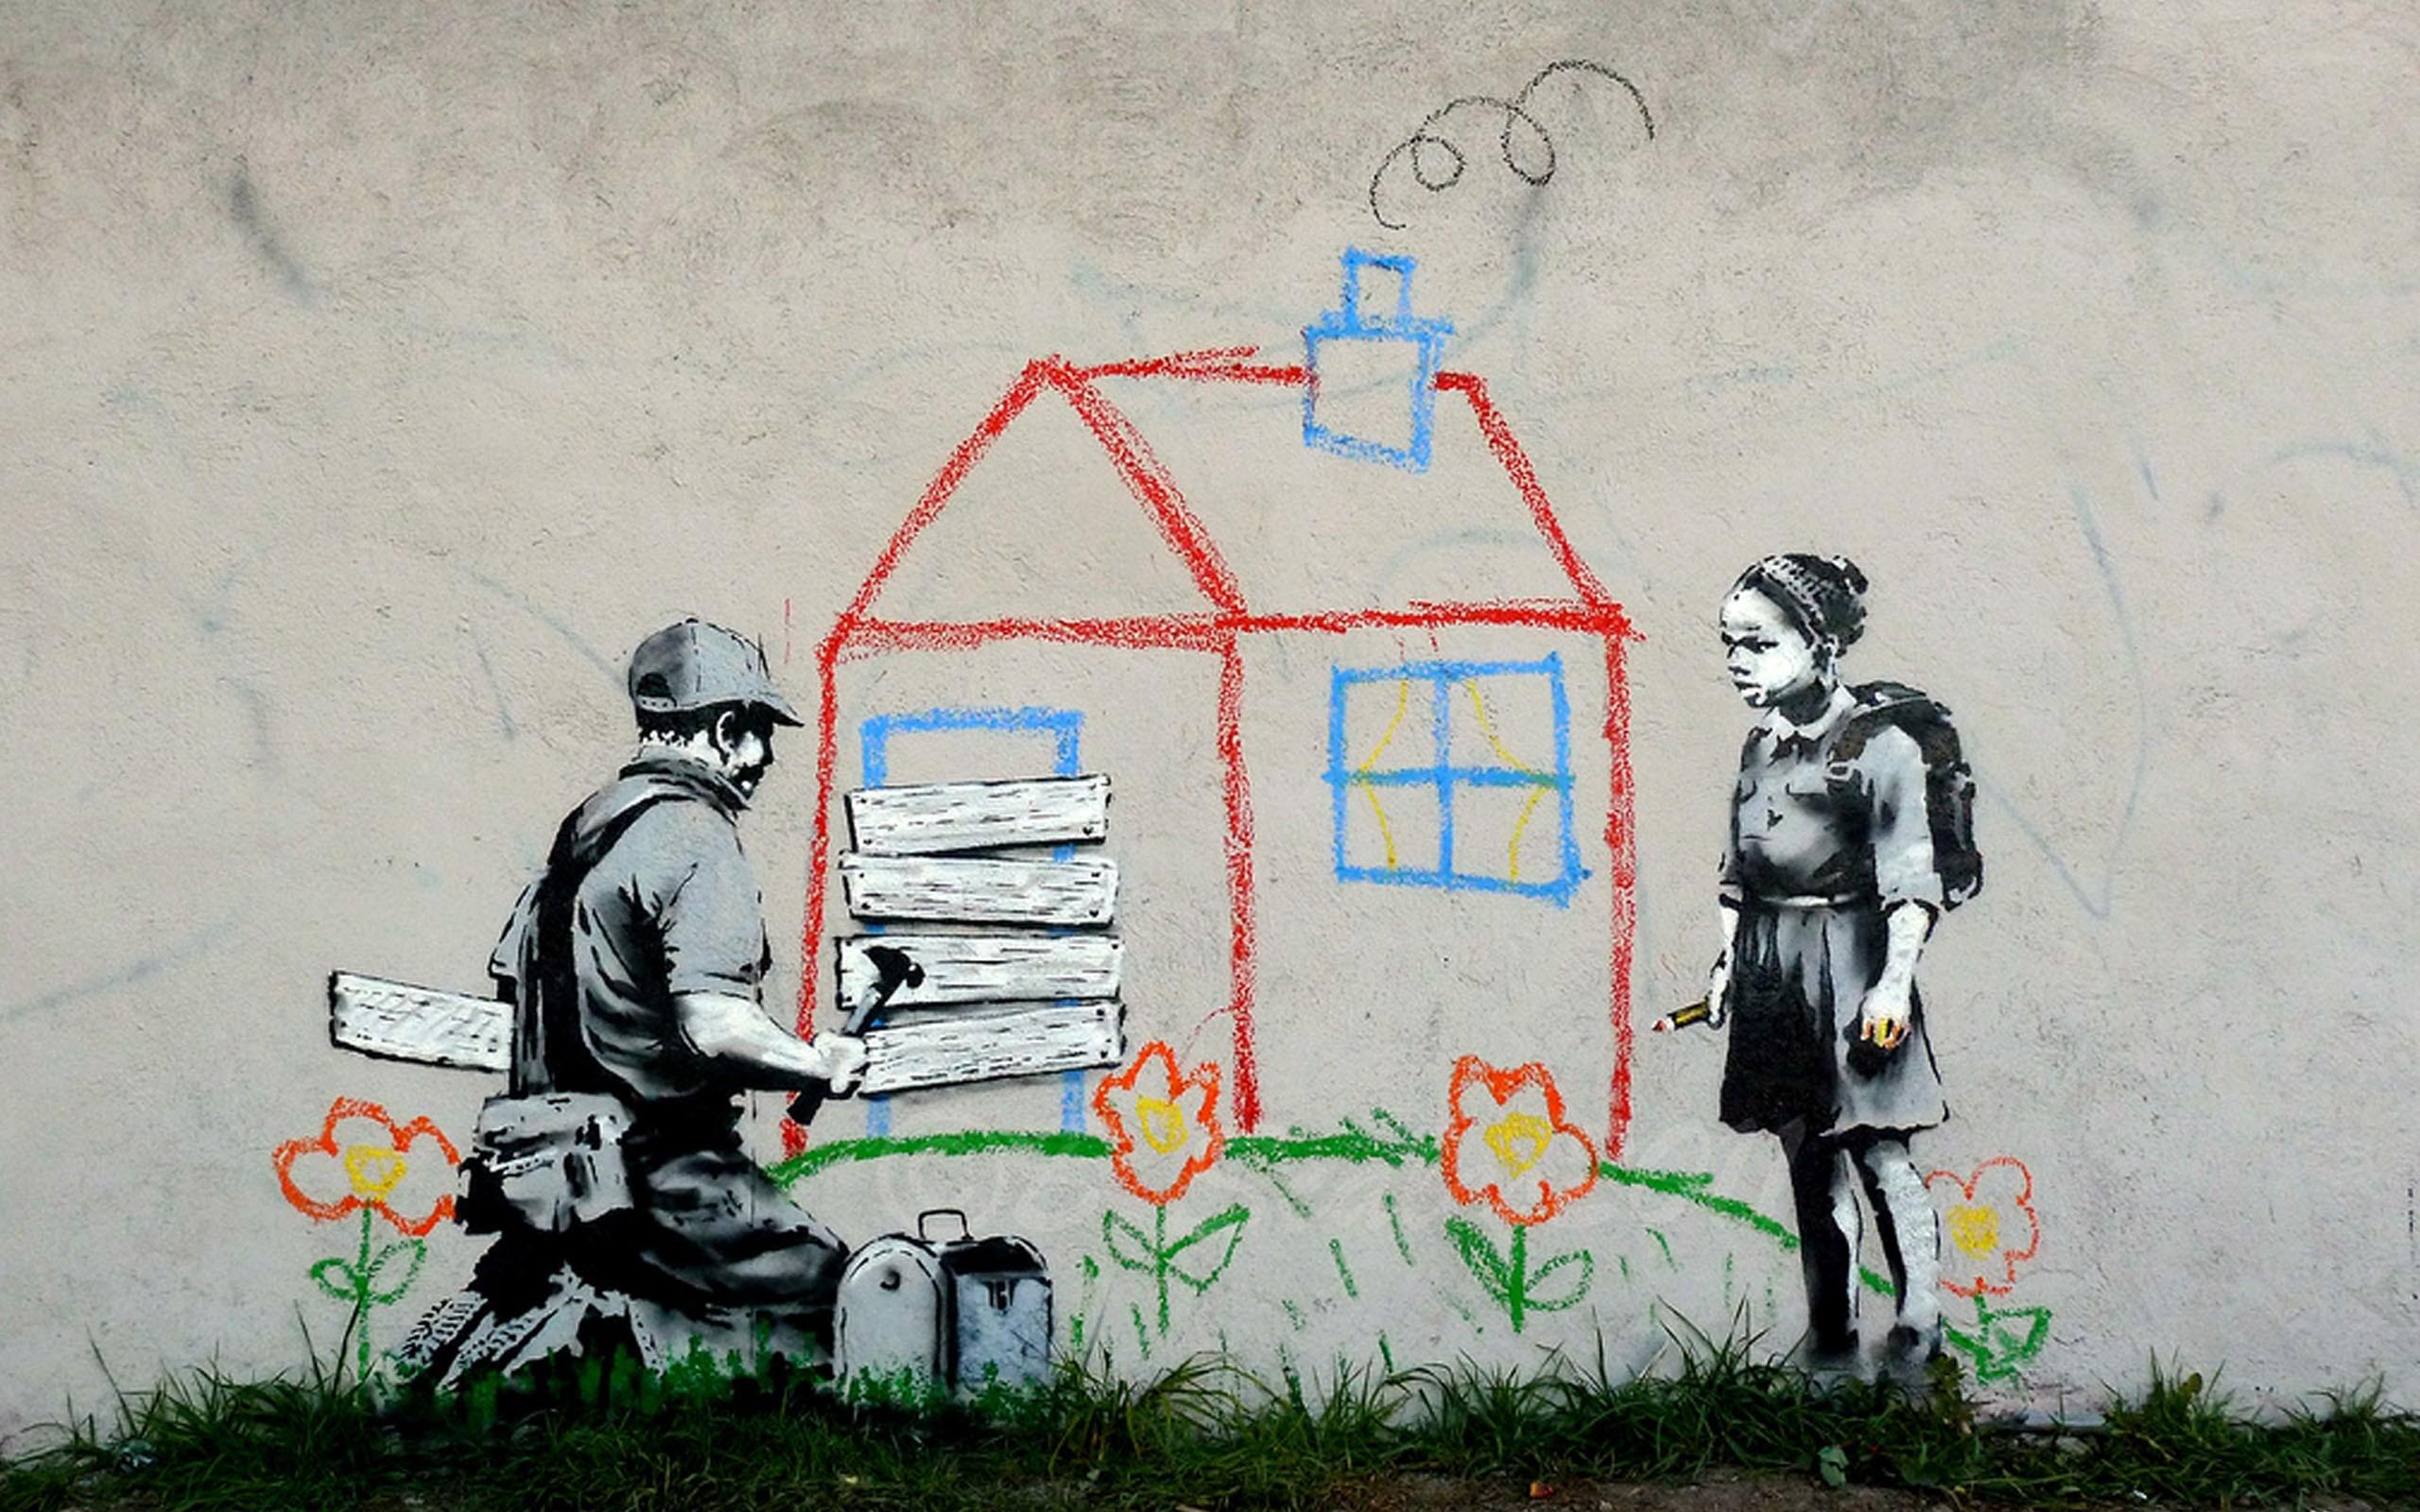 Top Banksy Art Wallpaper Images for Pinterest